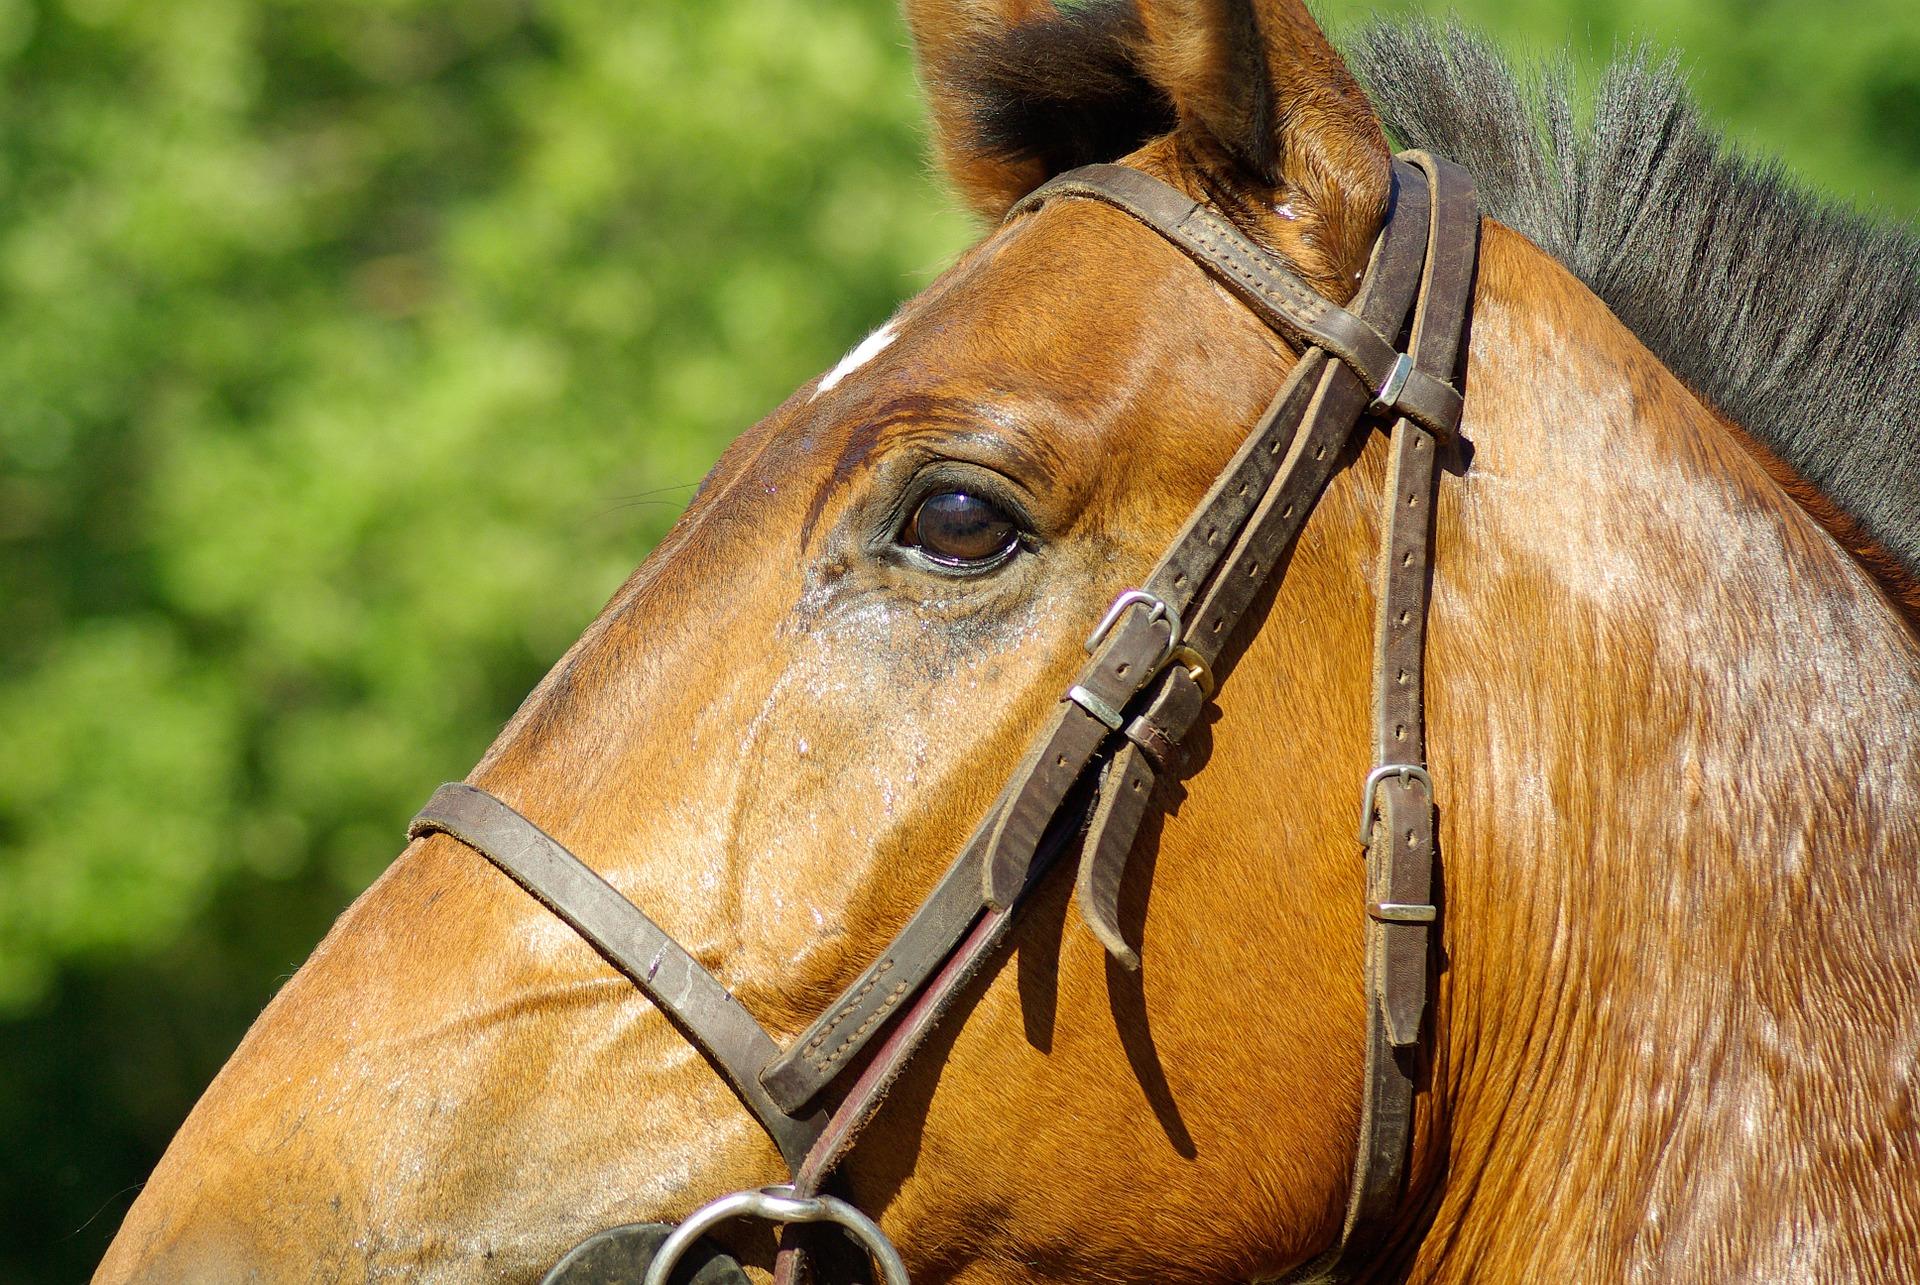 horse-800851_1920